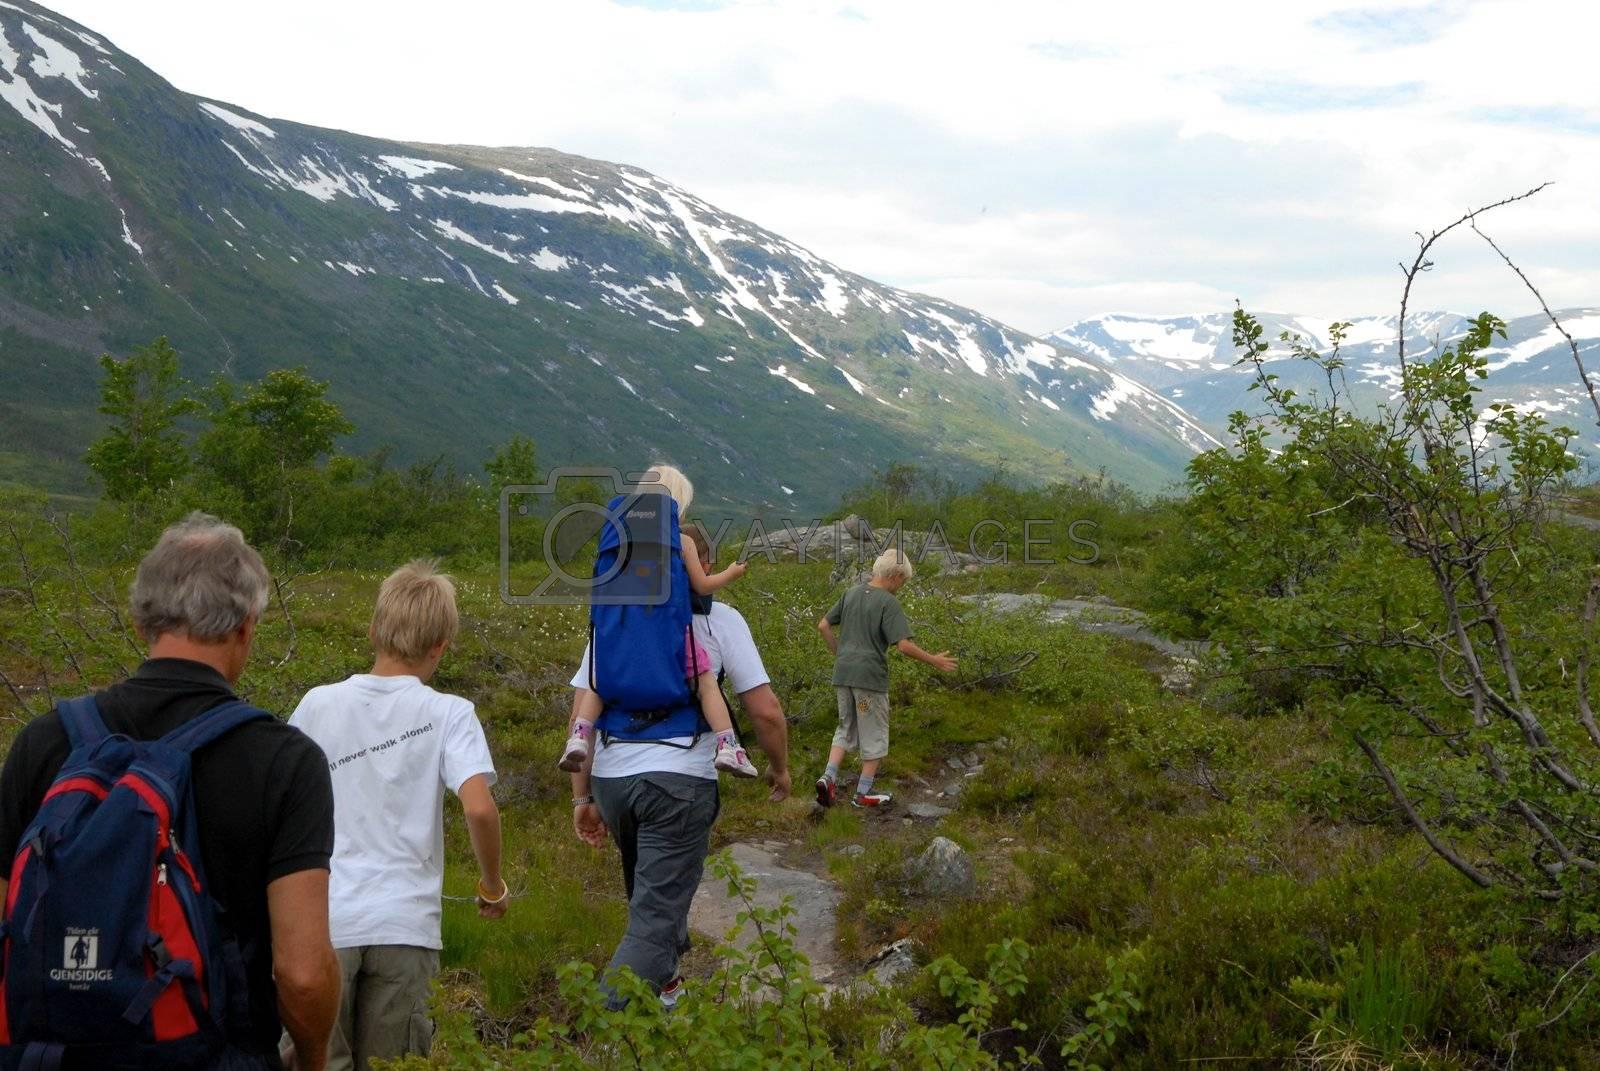 Scandinavian Lifestyle - hiking in the wild by Bildehagen